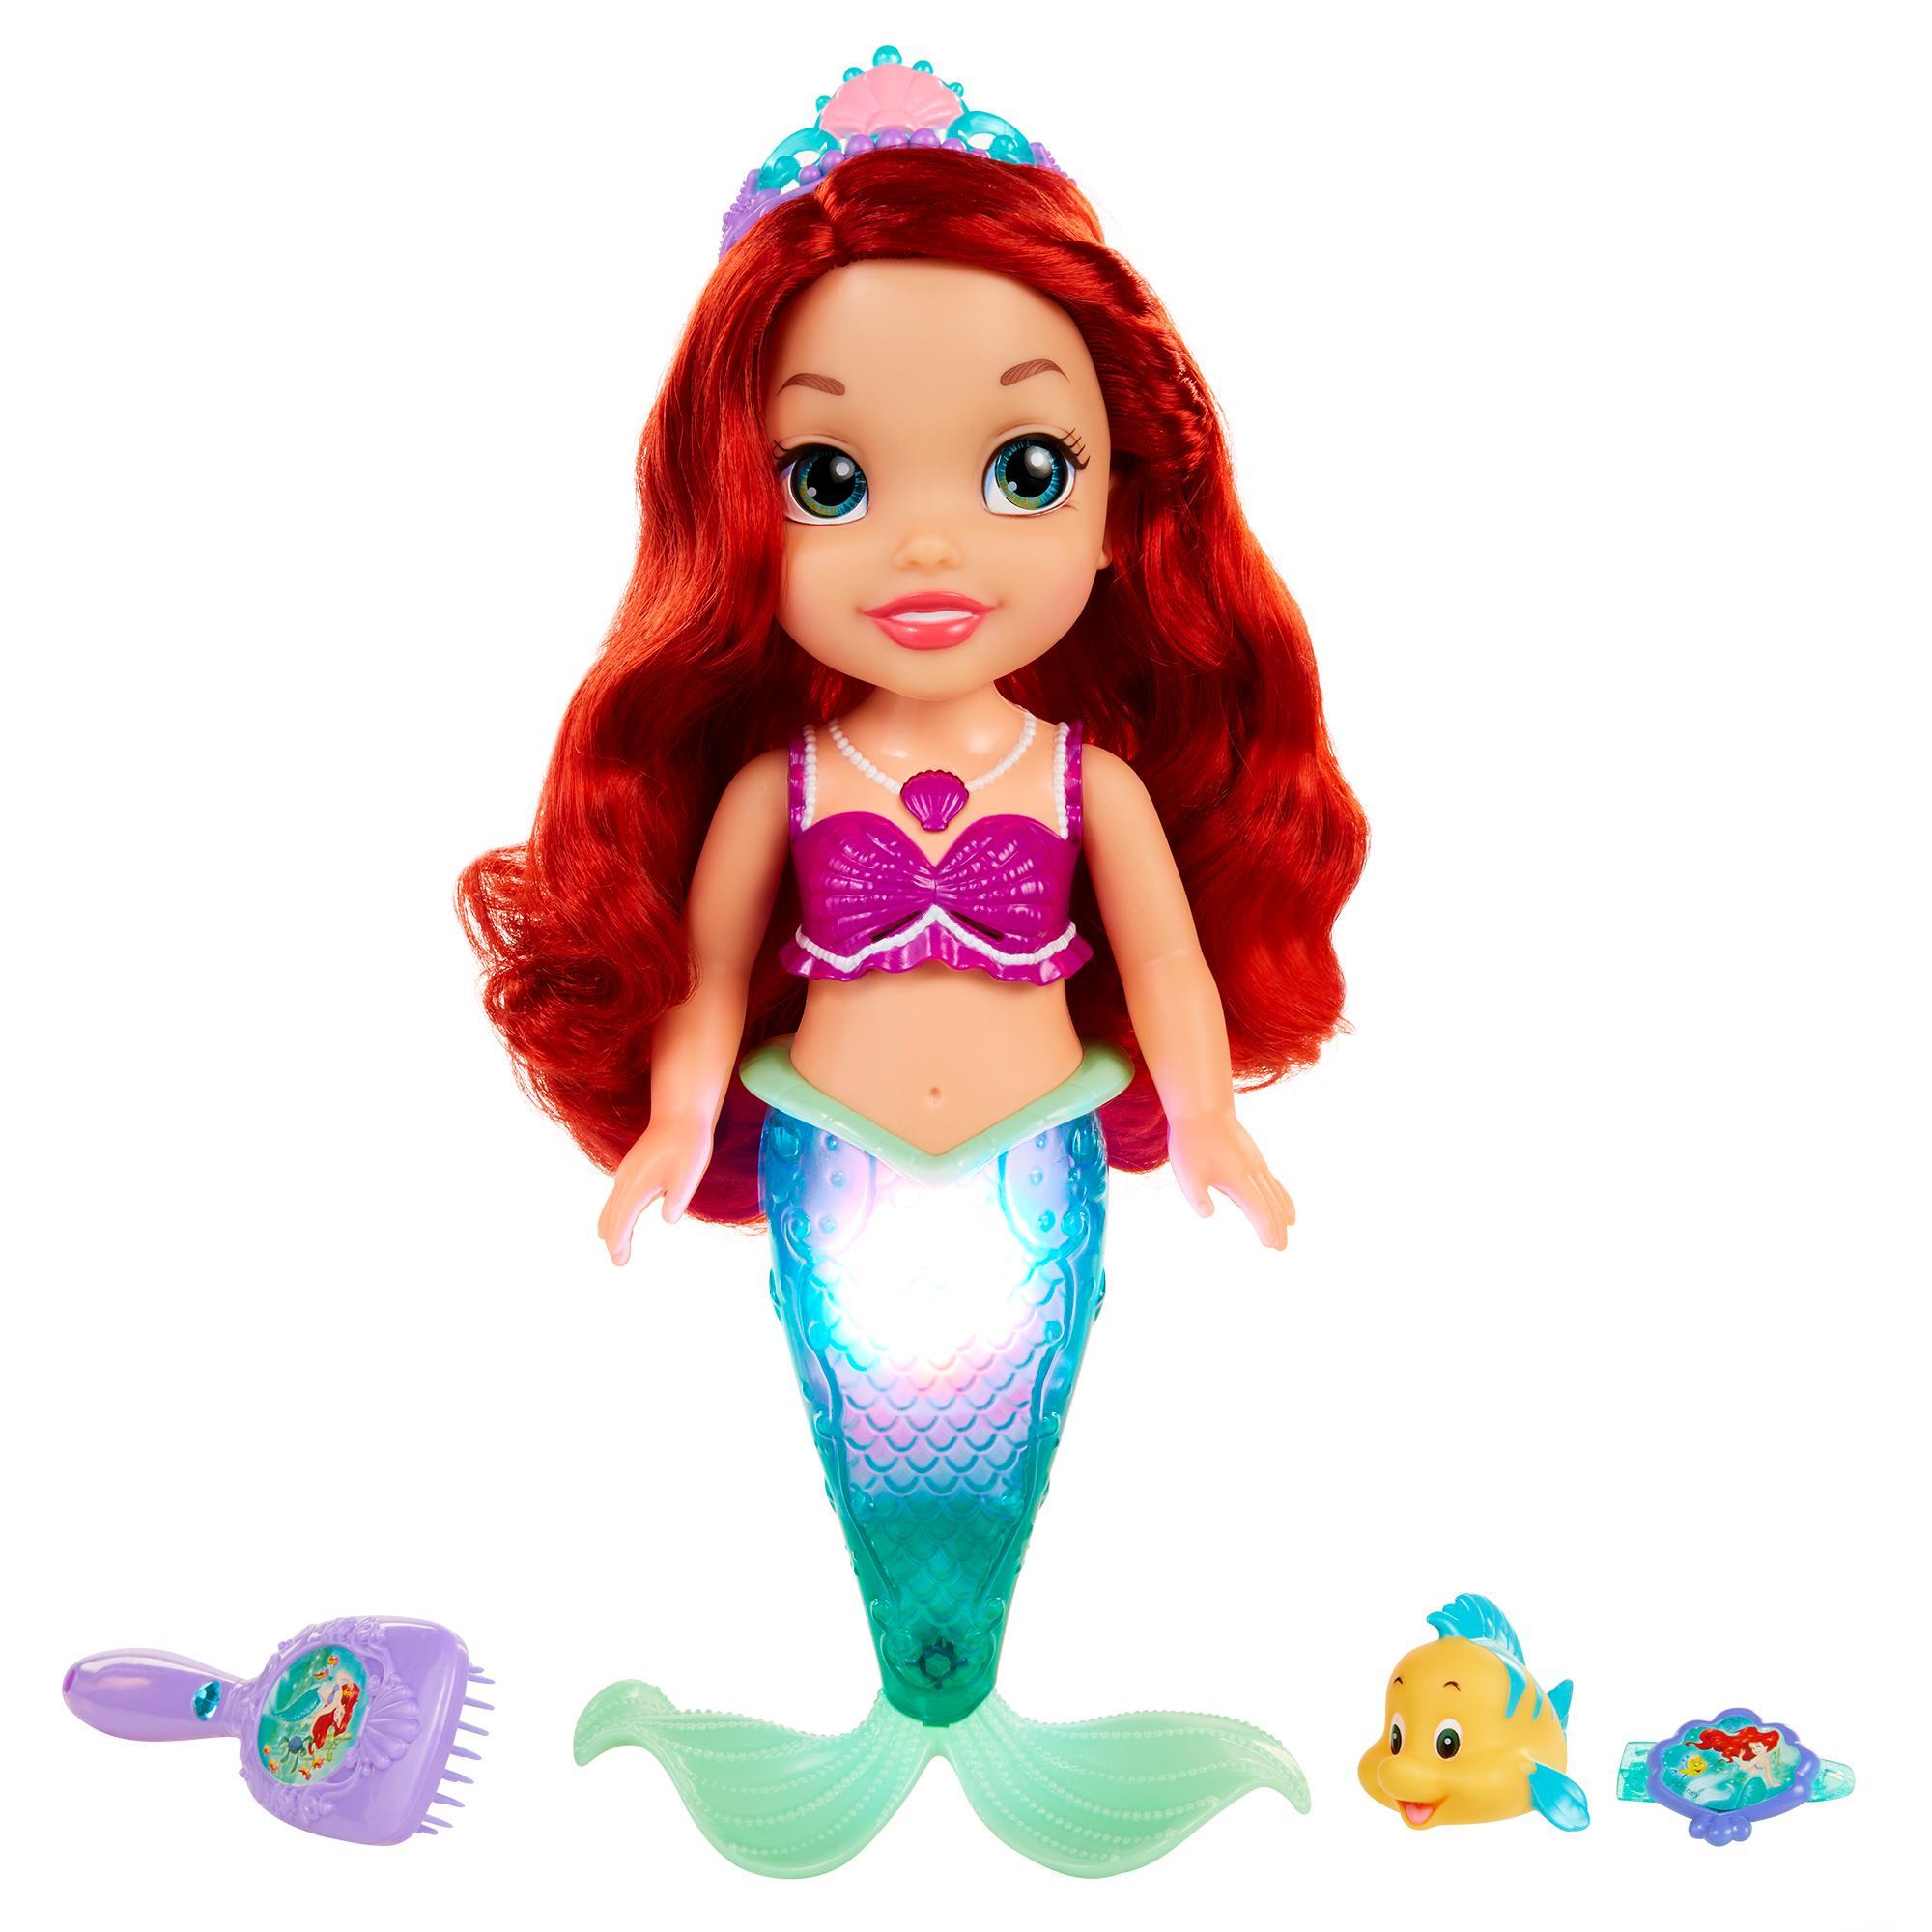 Disney Princess: Amazon.com: Disney Princess Colors Of The Sea Ariel Doll